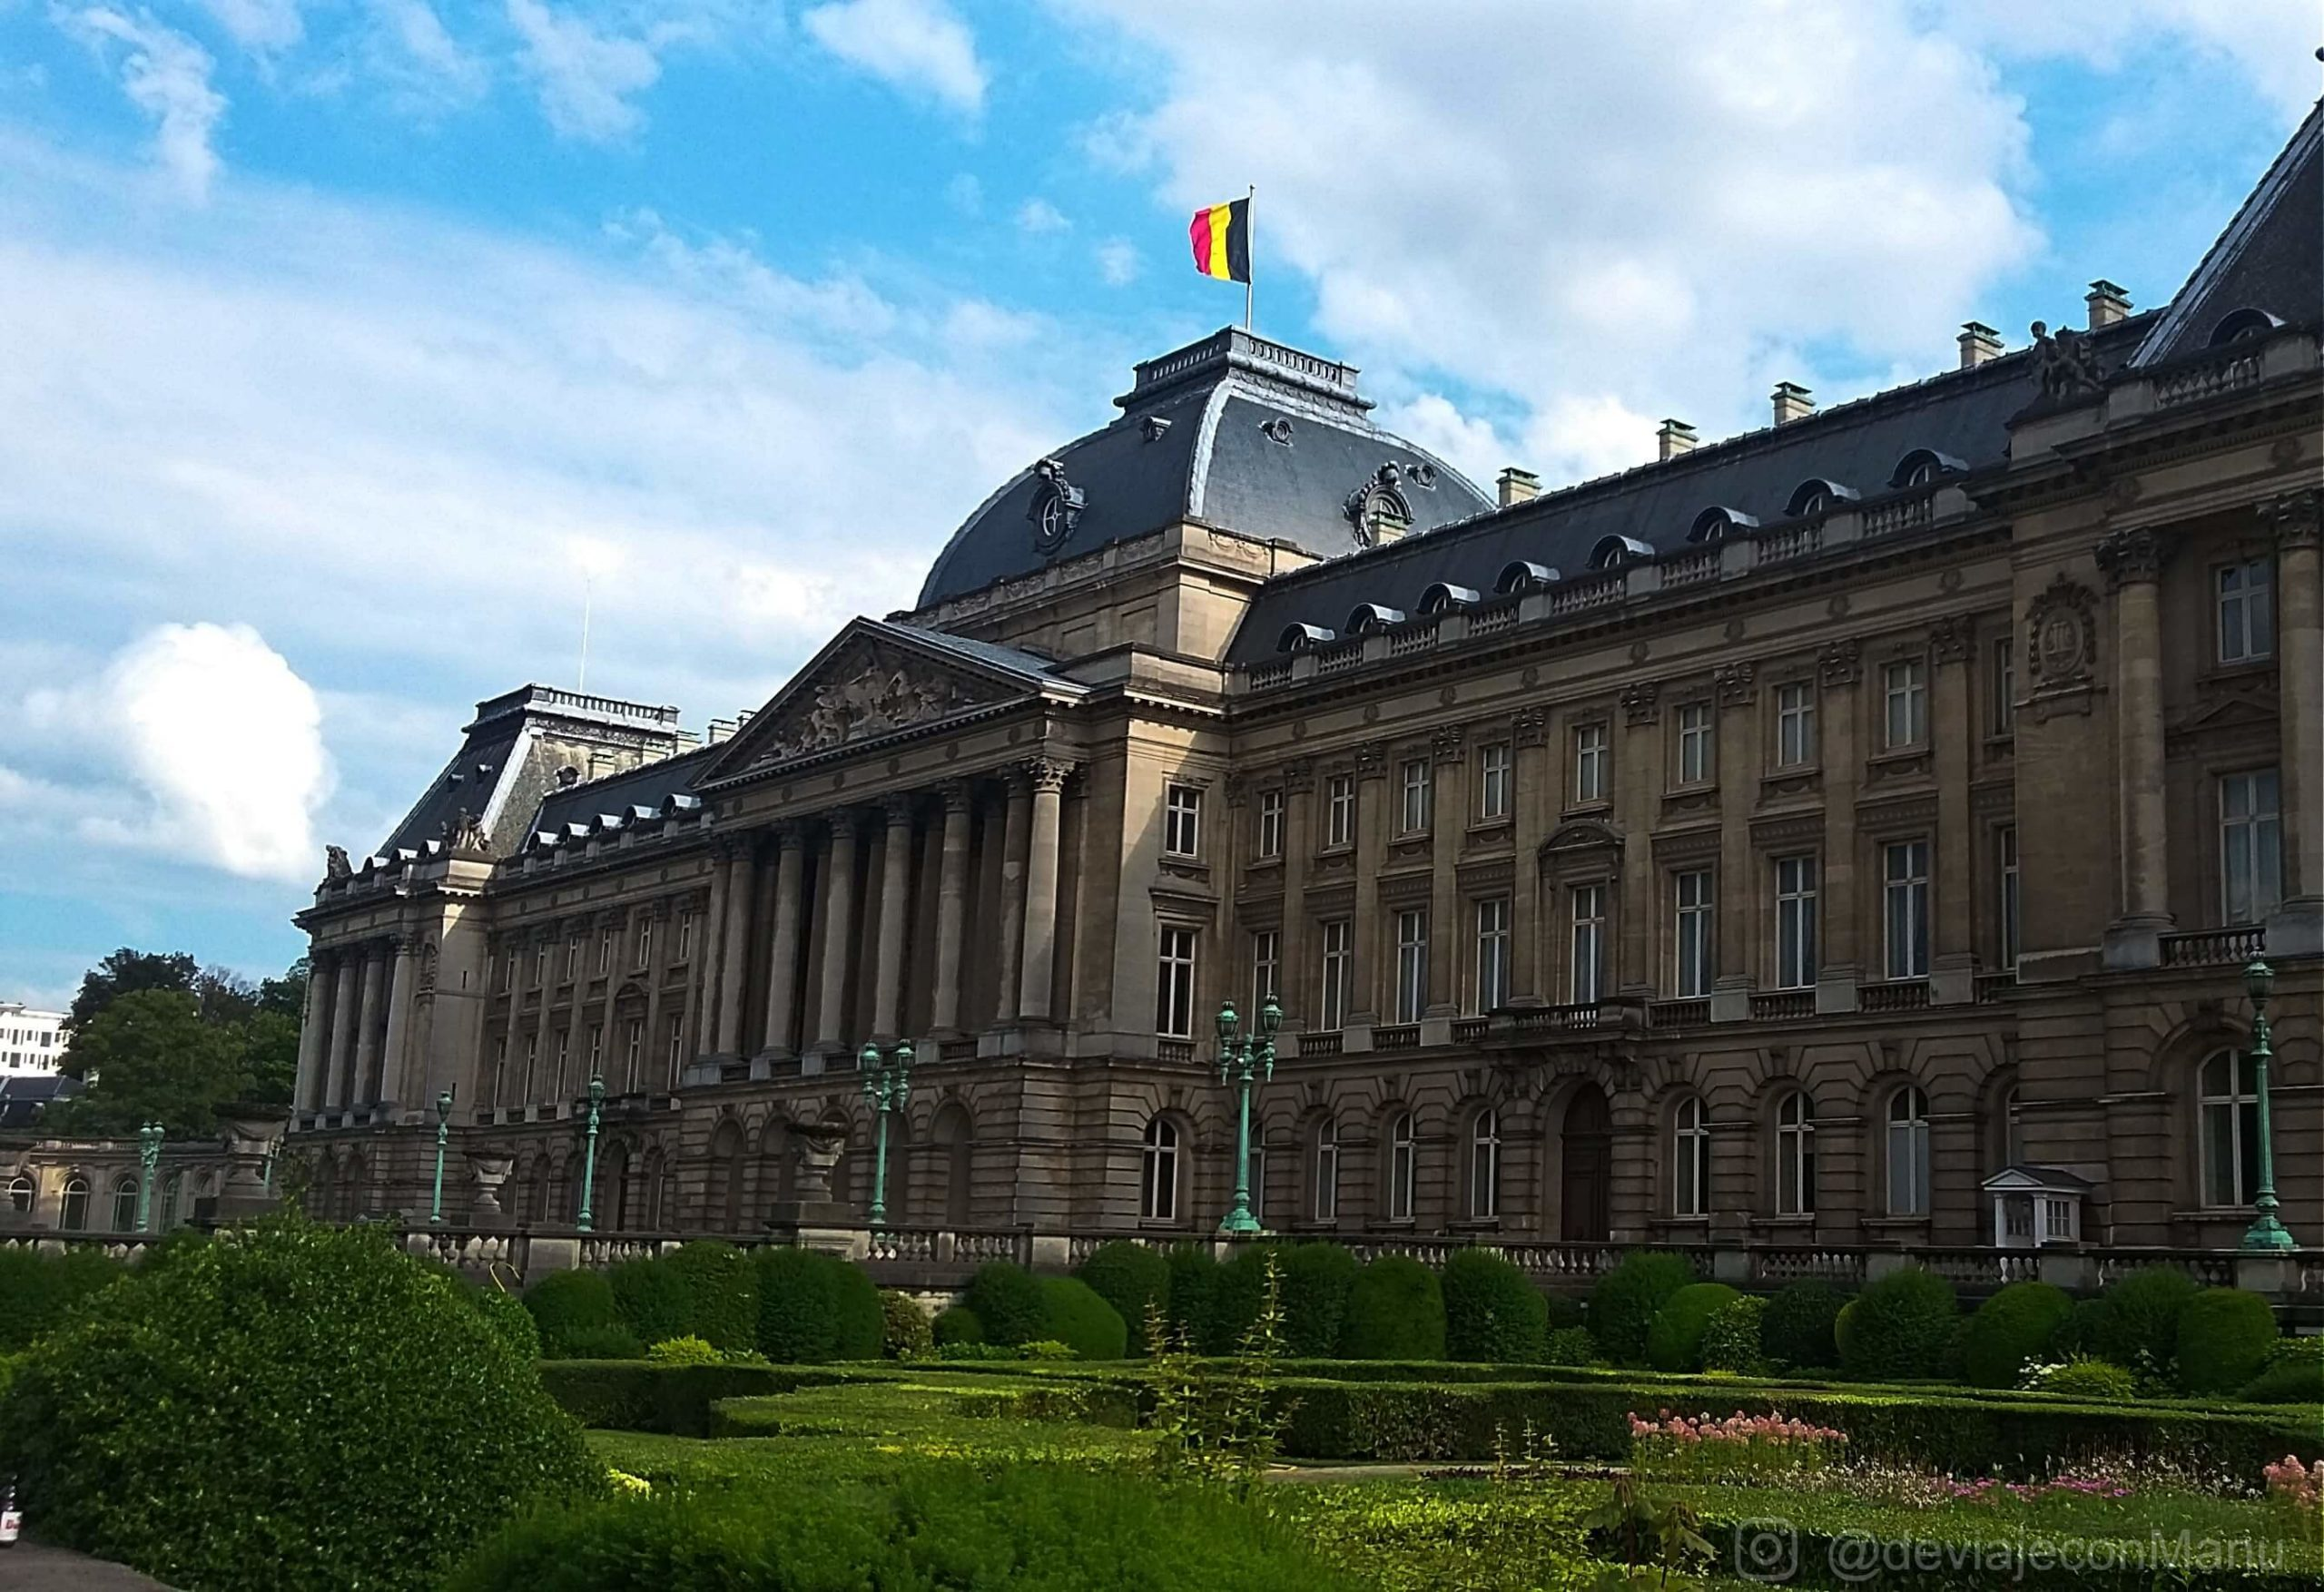 Palacio Real de Bélgica